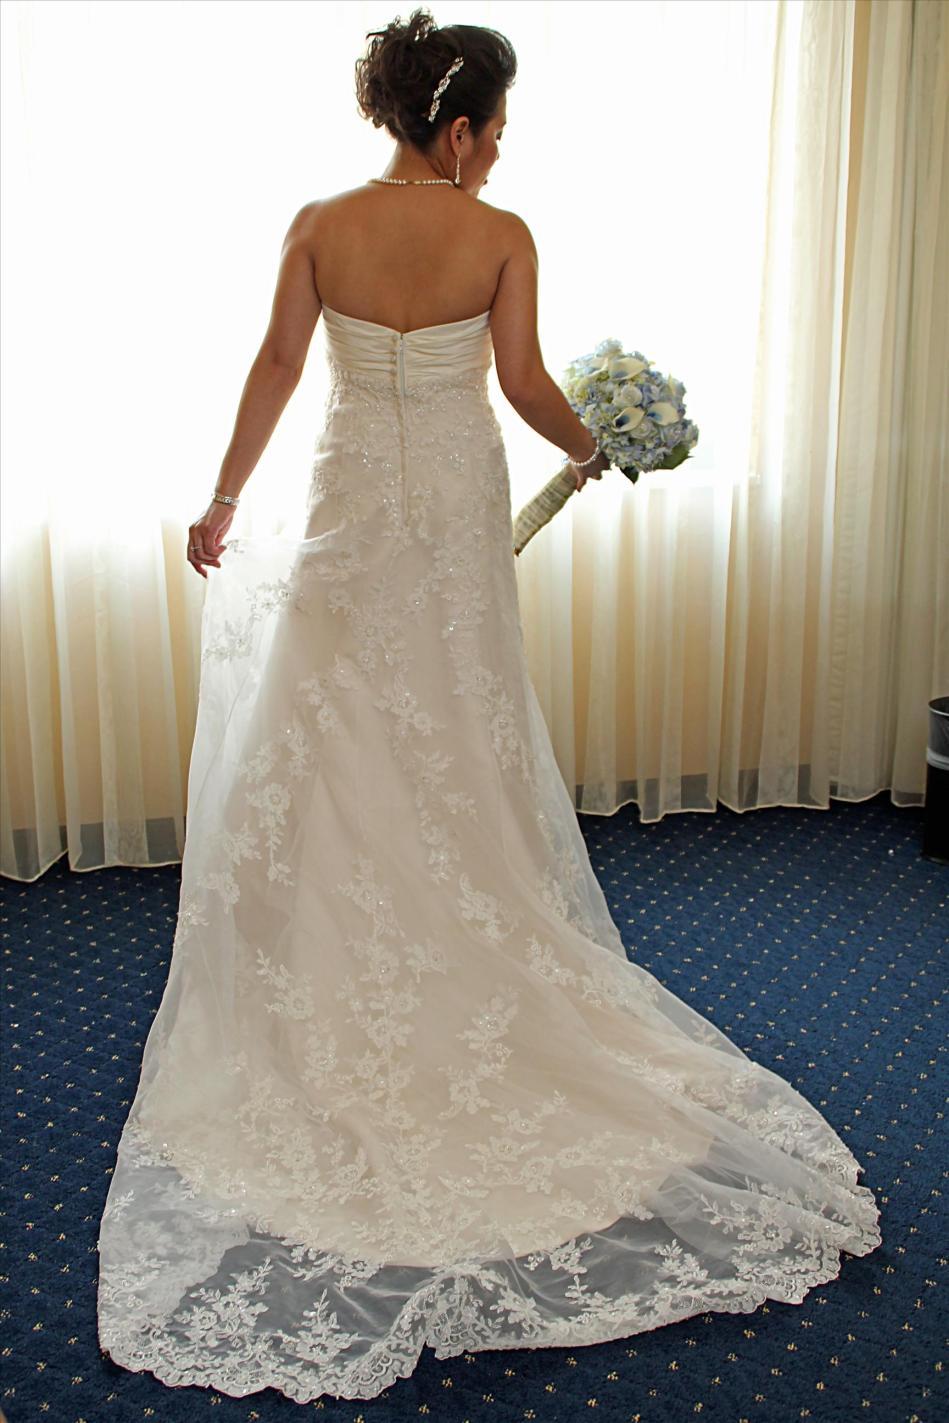 bridesdress.bridesbouquet.bridalprep.weddingphotos.apicturesquememoryphotography